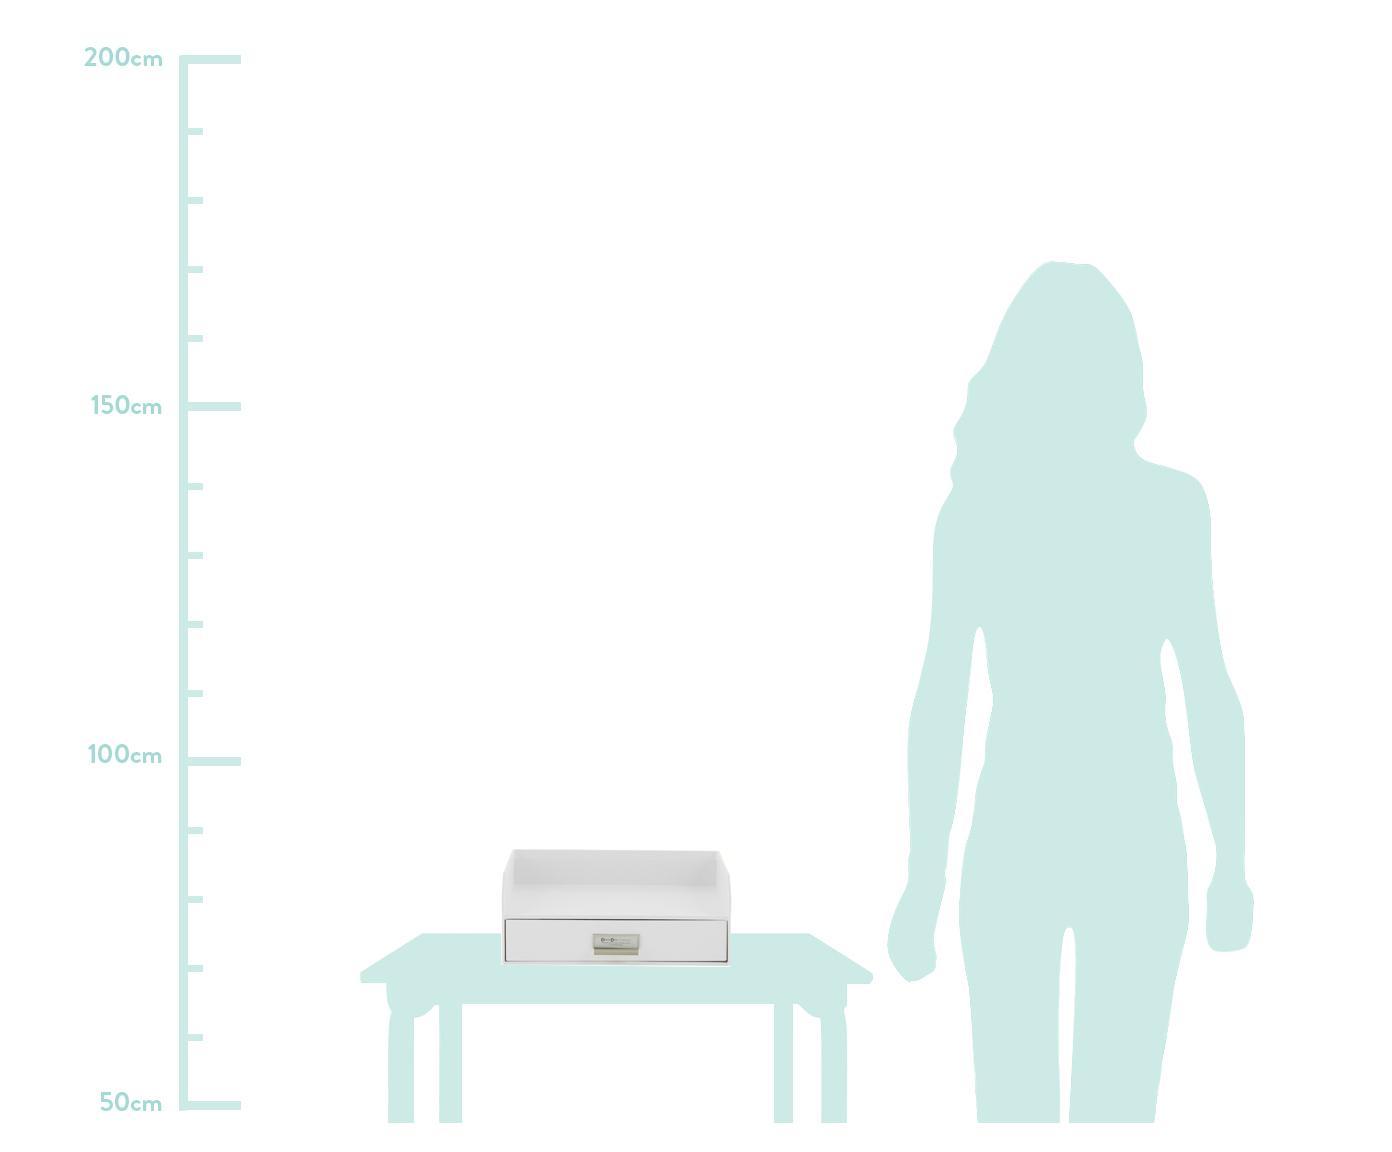 Büro-Organizer Walter, Organizer: Fester, laminierter Karto, Weiß, 33 x 13 cm